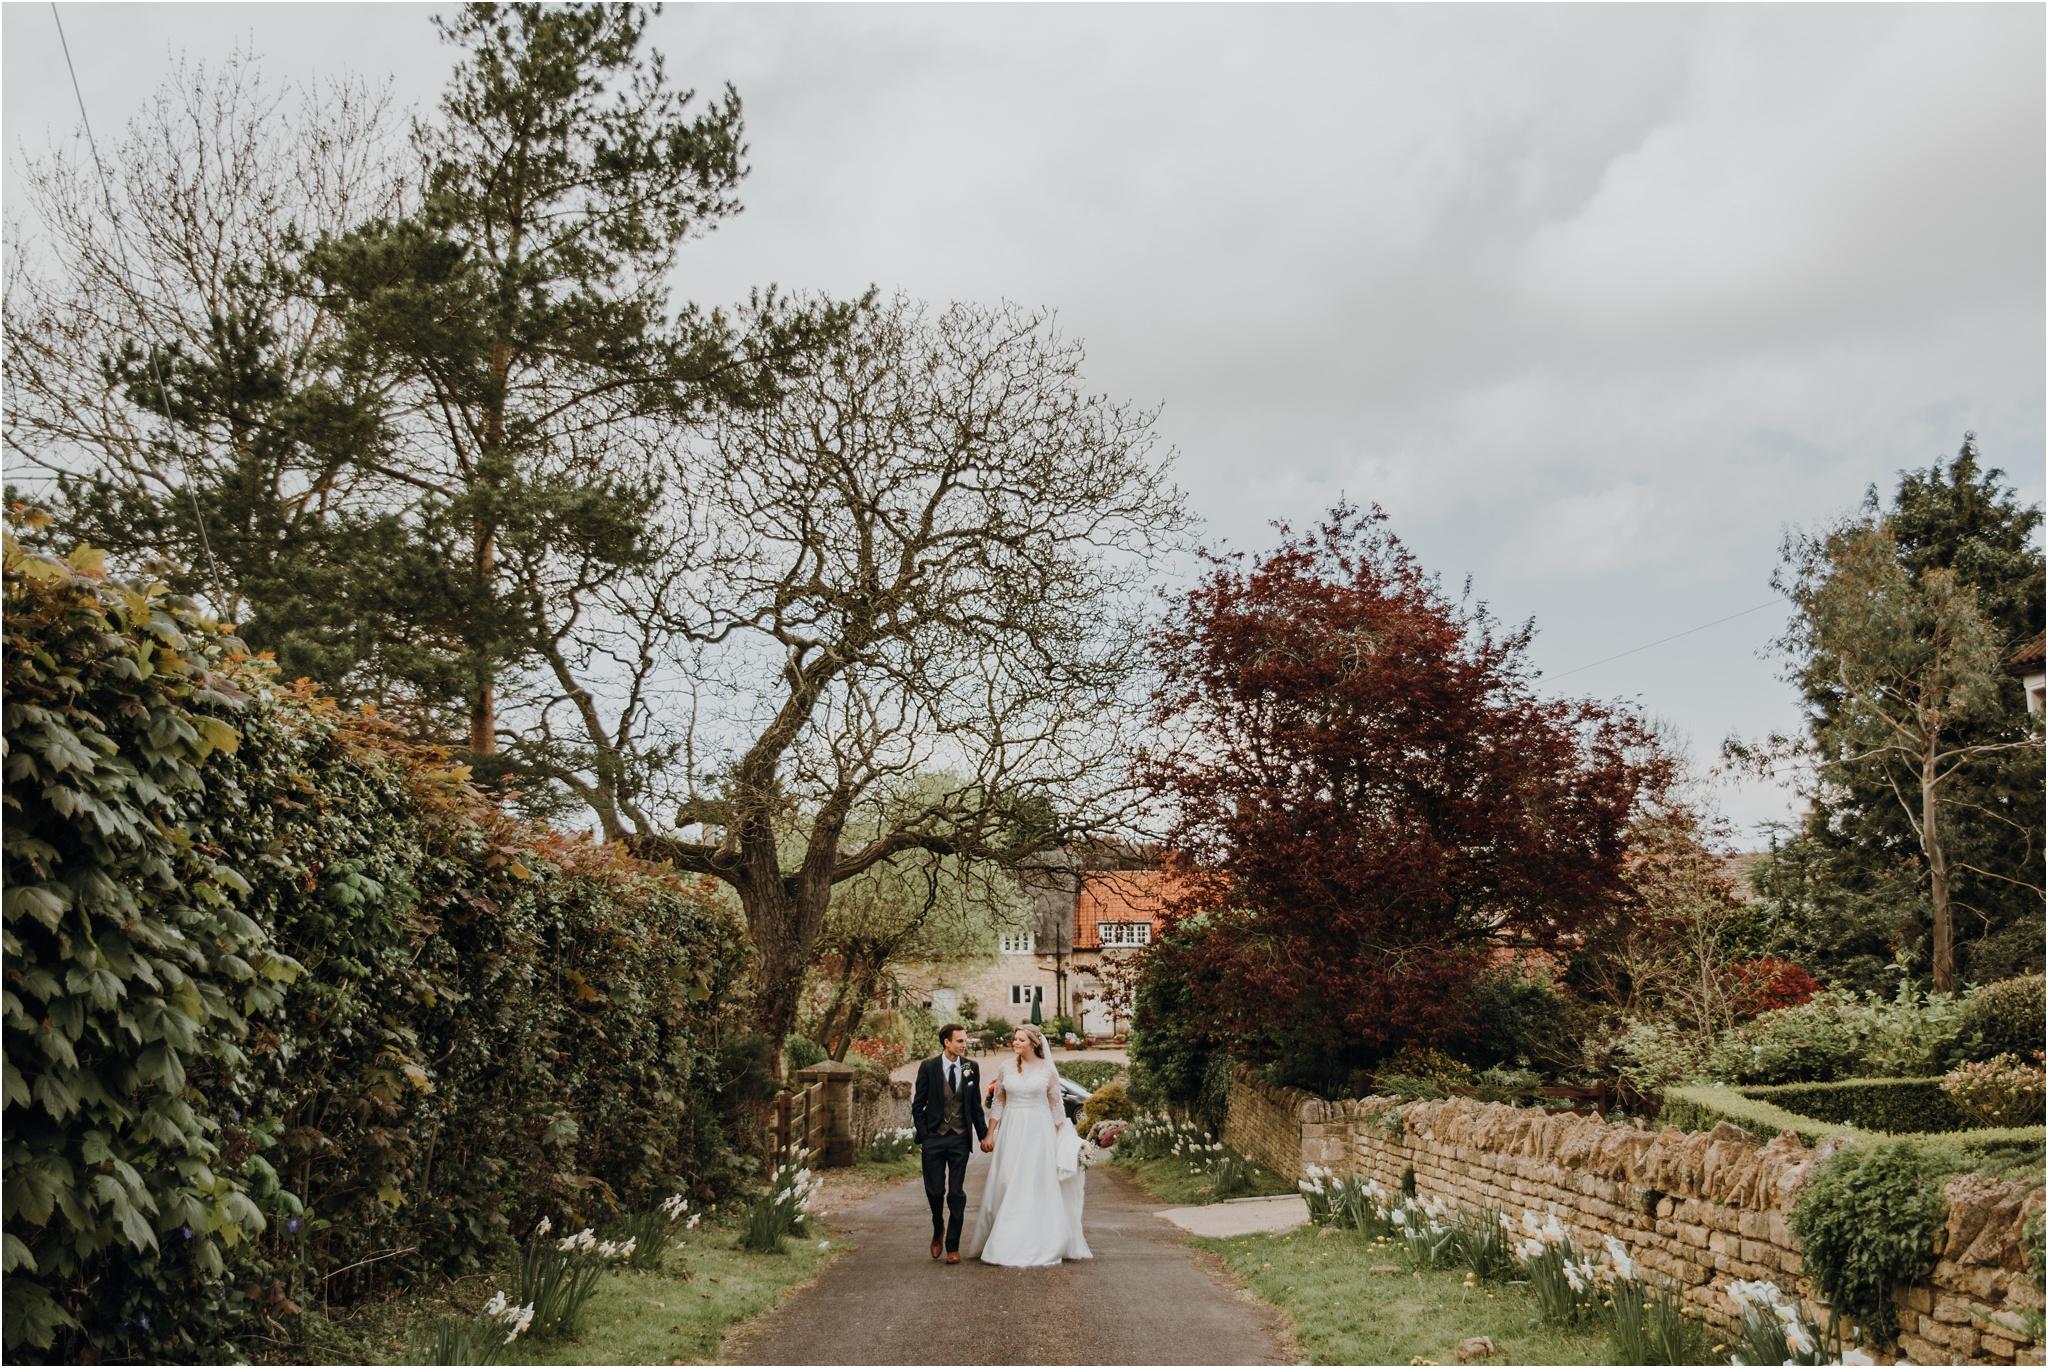 Outdoor-country-wedding-Edinburgh-photographer__0087.jpg